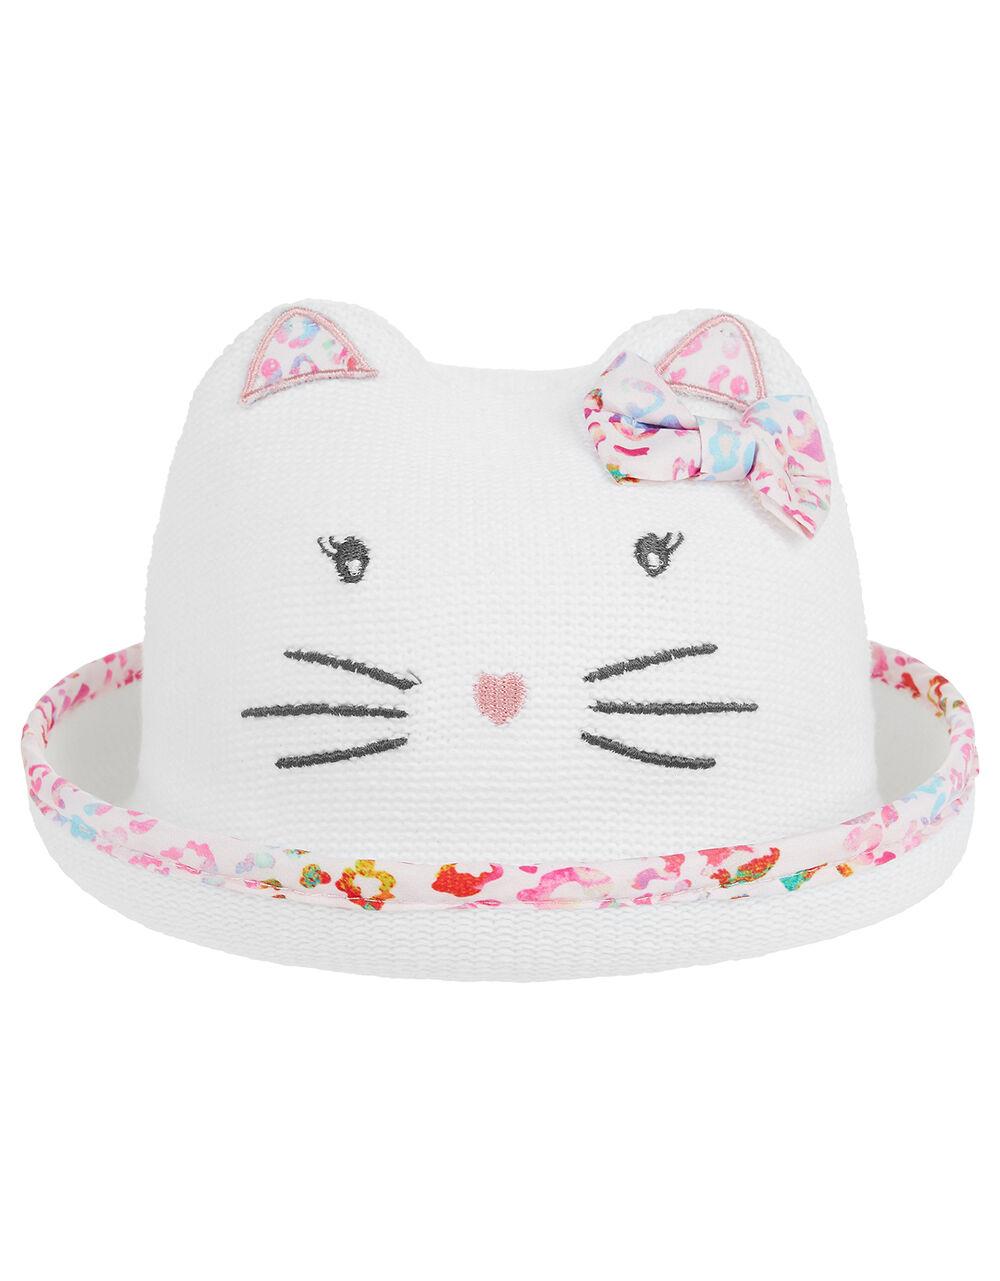 Baby Debbie Kitty Bowler Hat in Organic Cotton, Multi (MULTI), large